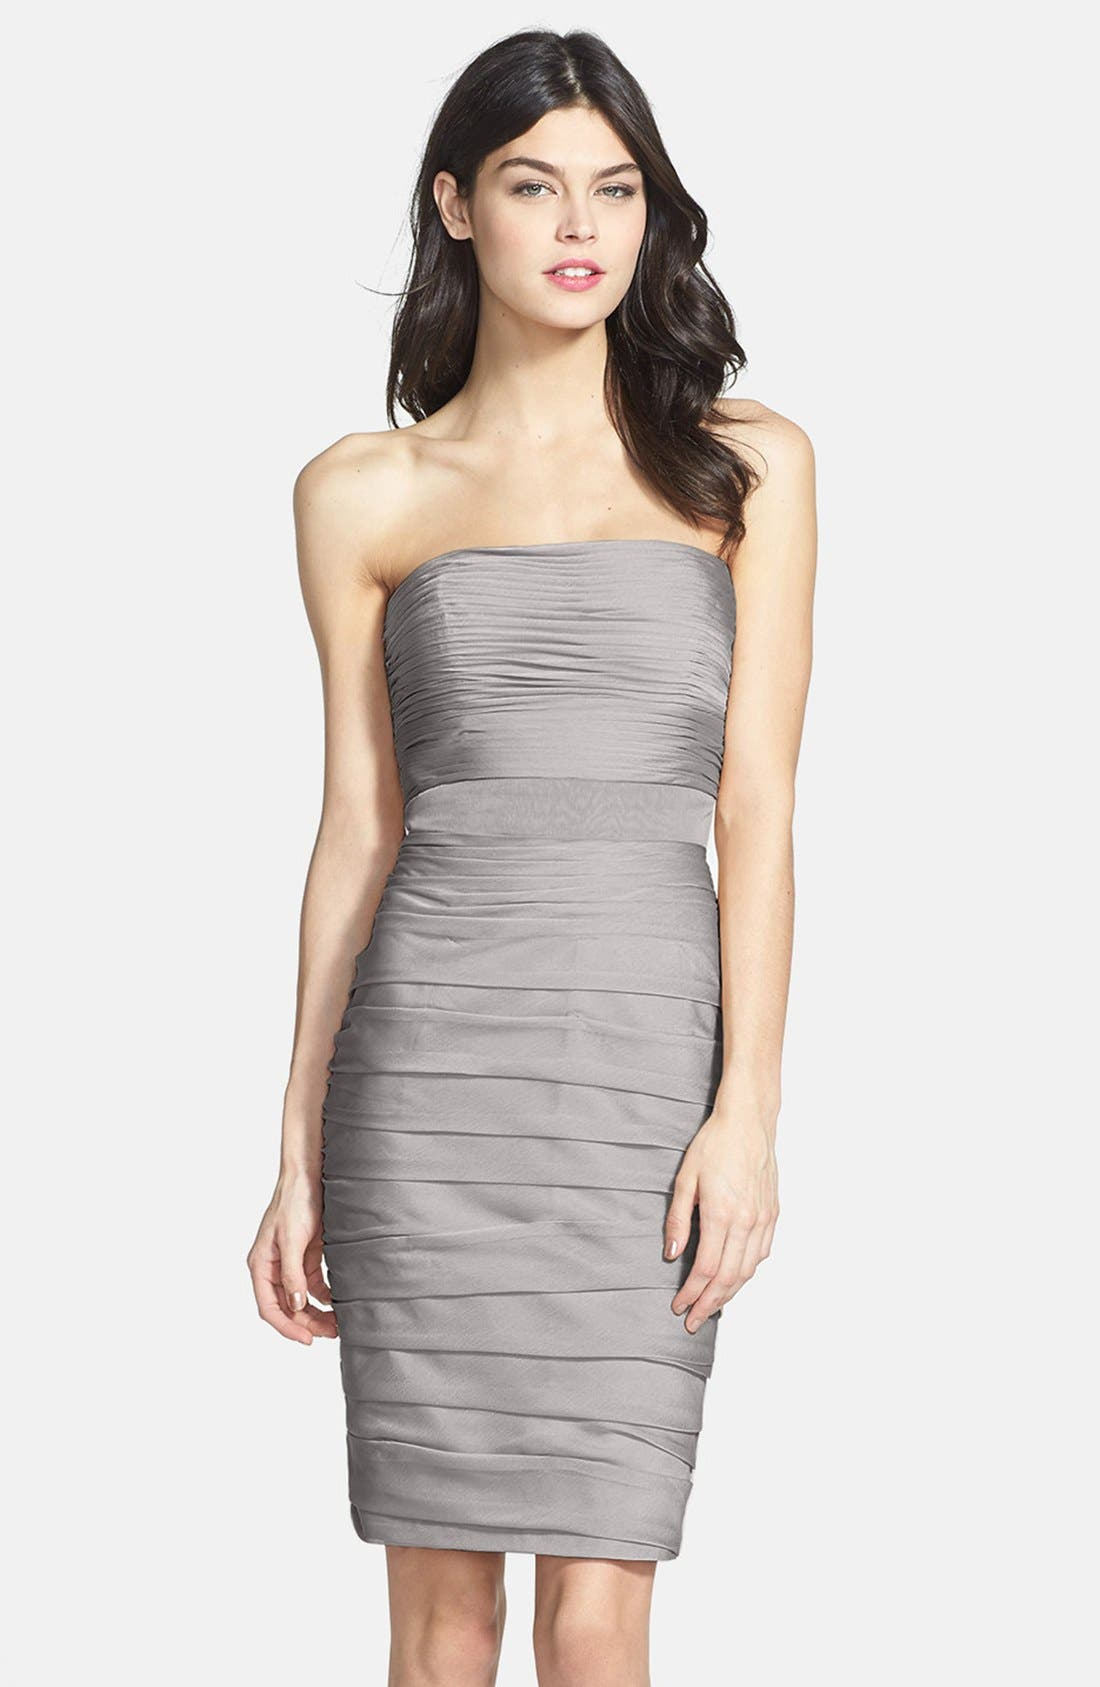 Main Image - Monique Lhuillier Bridesmaids Ruched Strapless Cationic Chiffon Dress (Nordstrom Exclusive) (Regular & Plus Size)